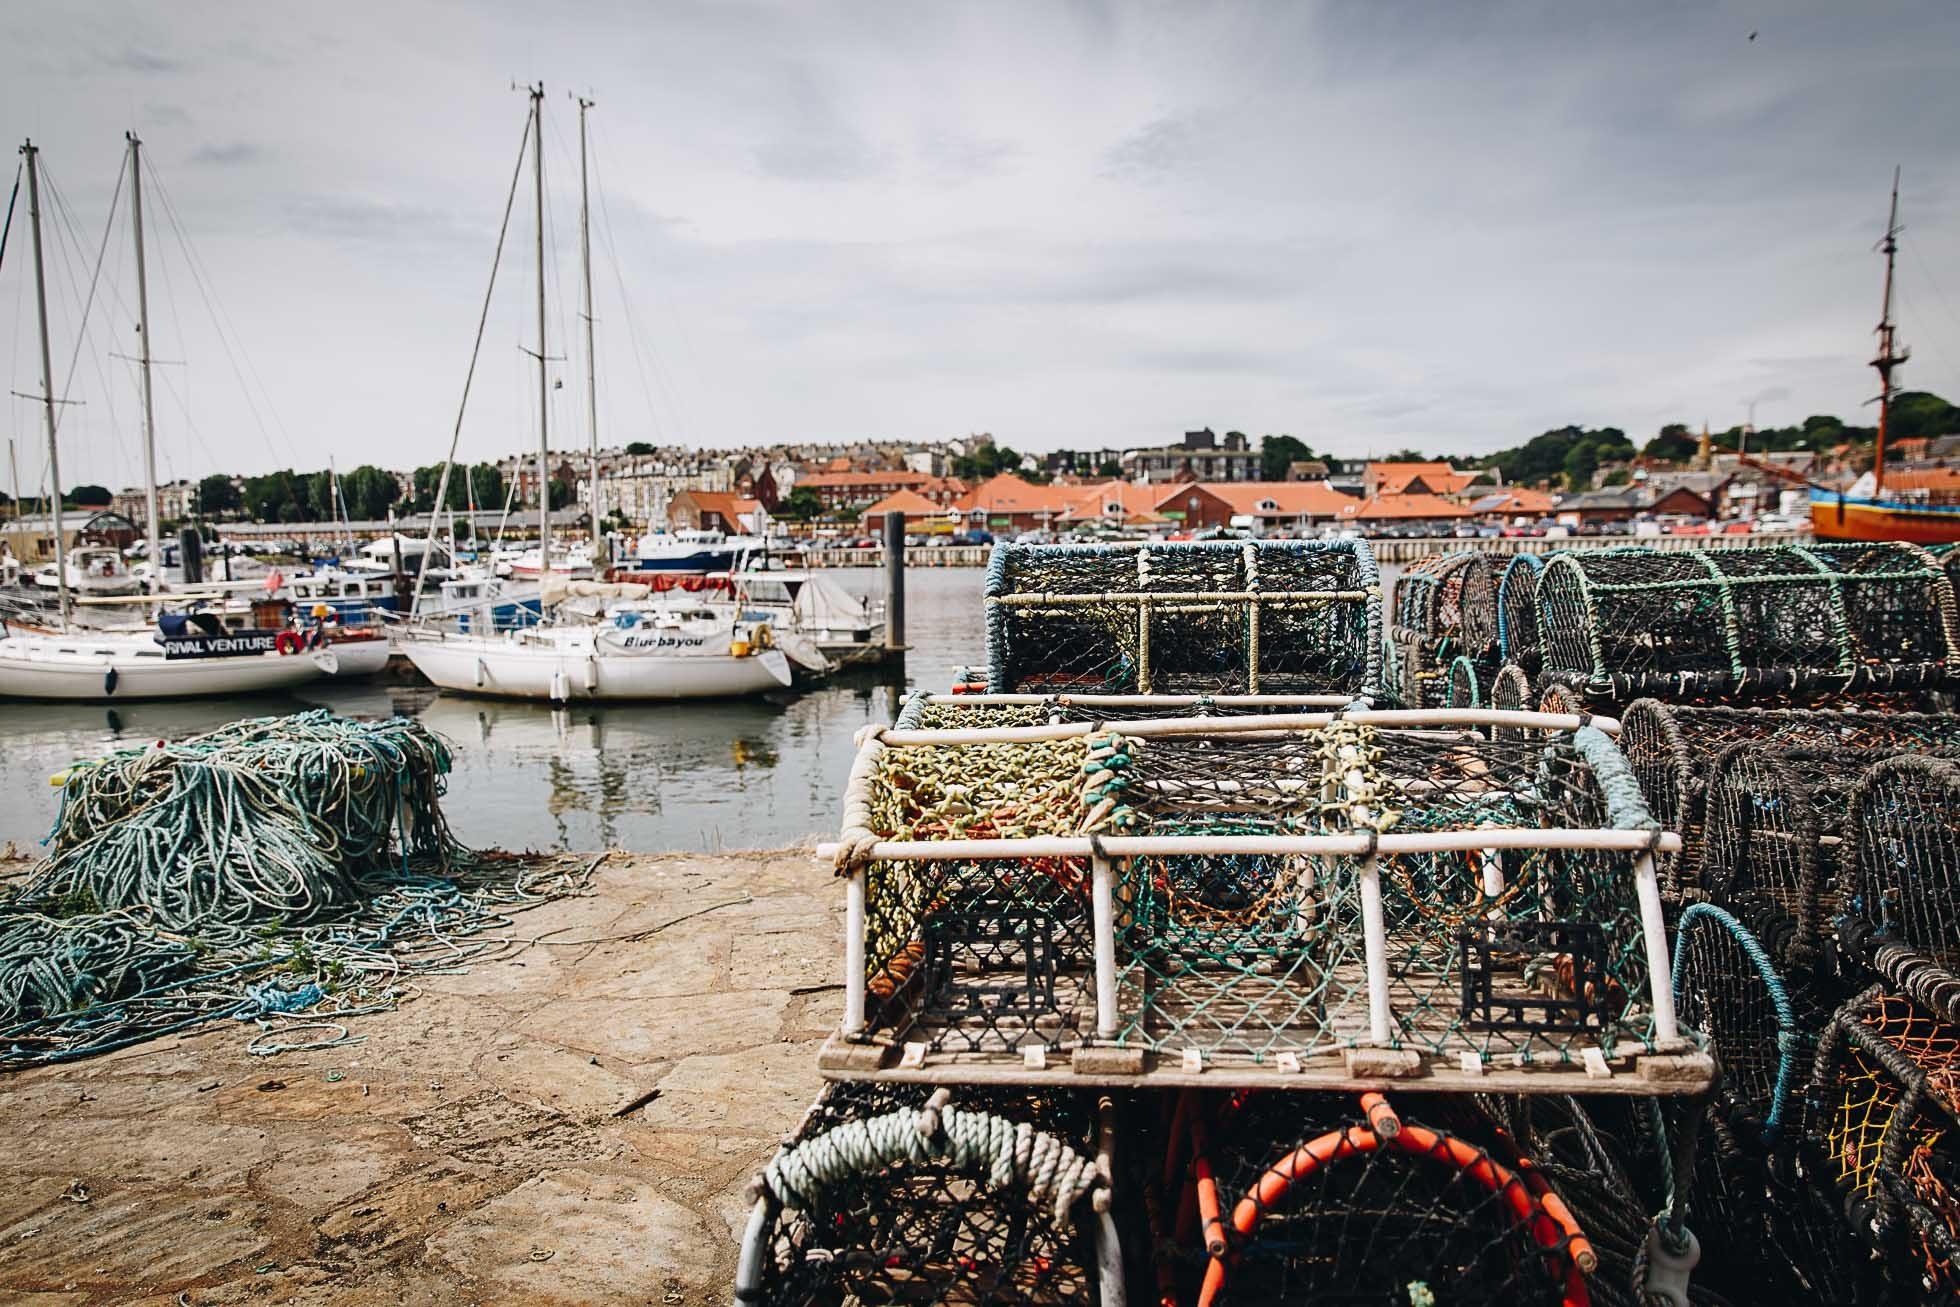 crab net catchers objects